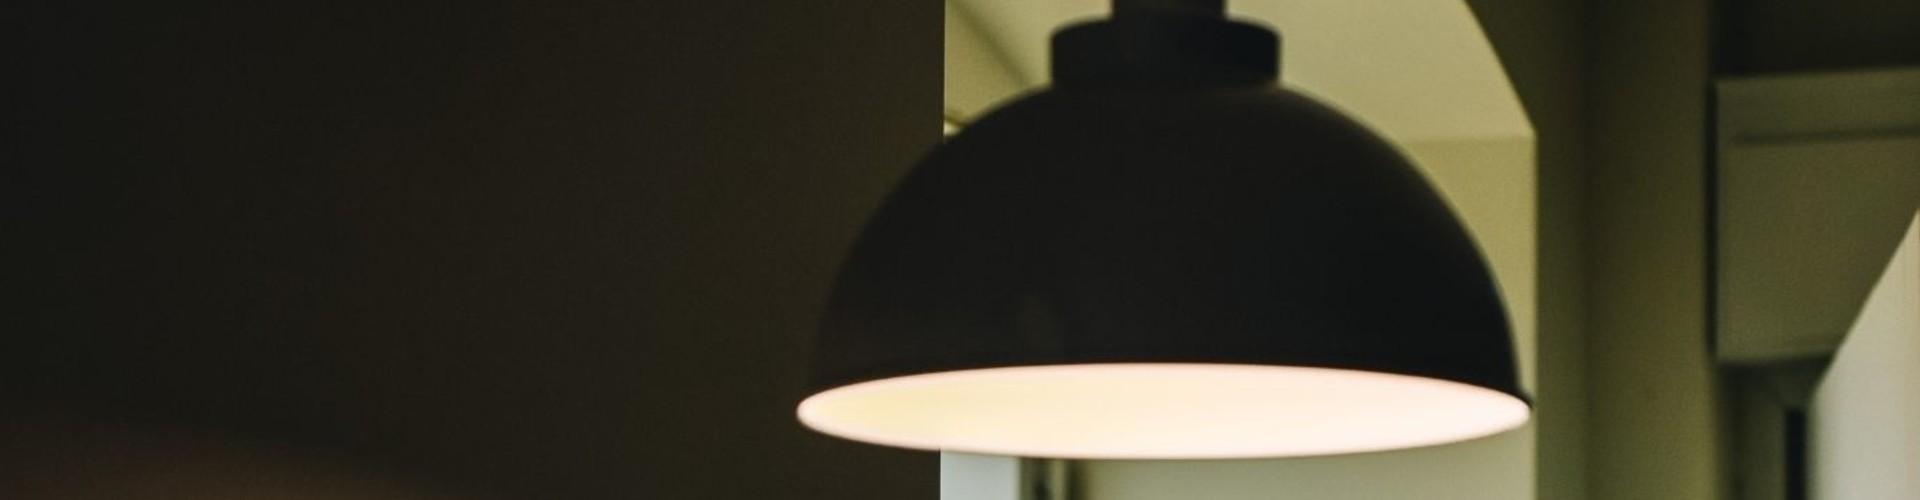 Urban Interiors wandlamp - Stoer en industrieel